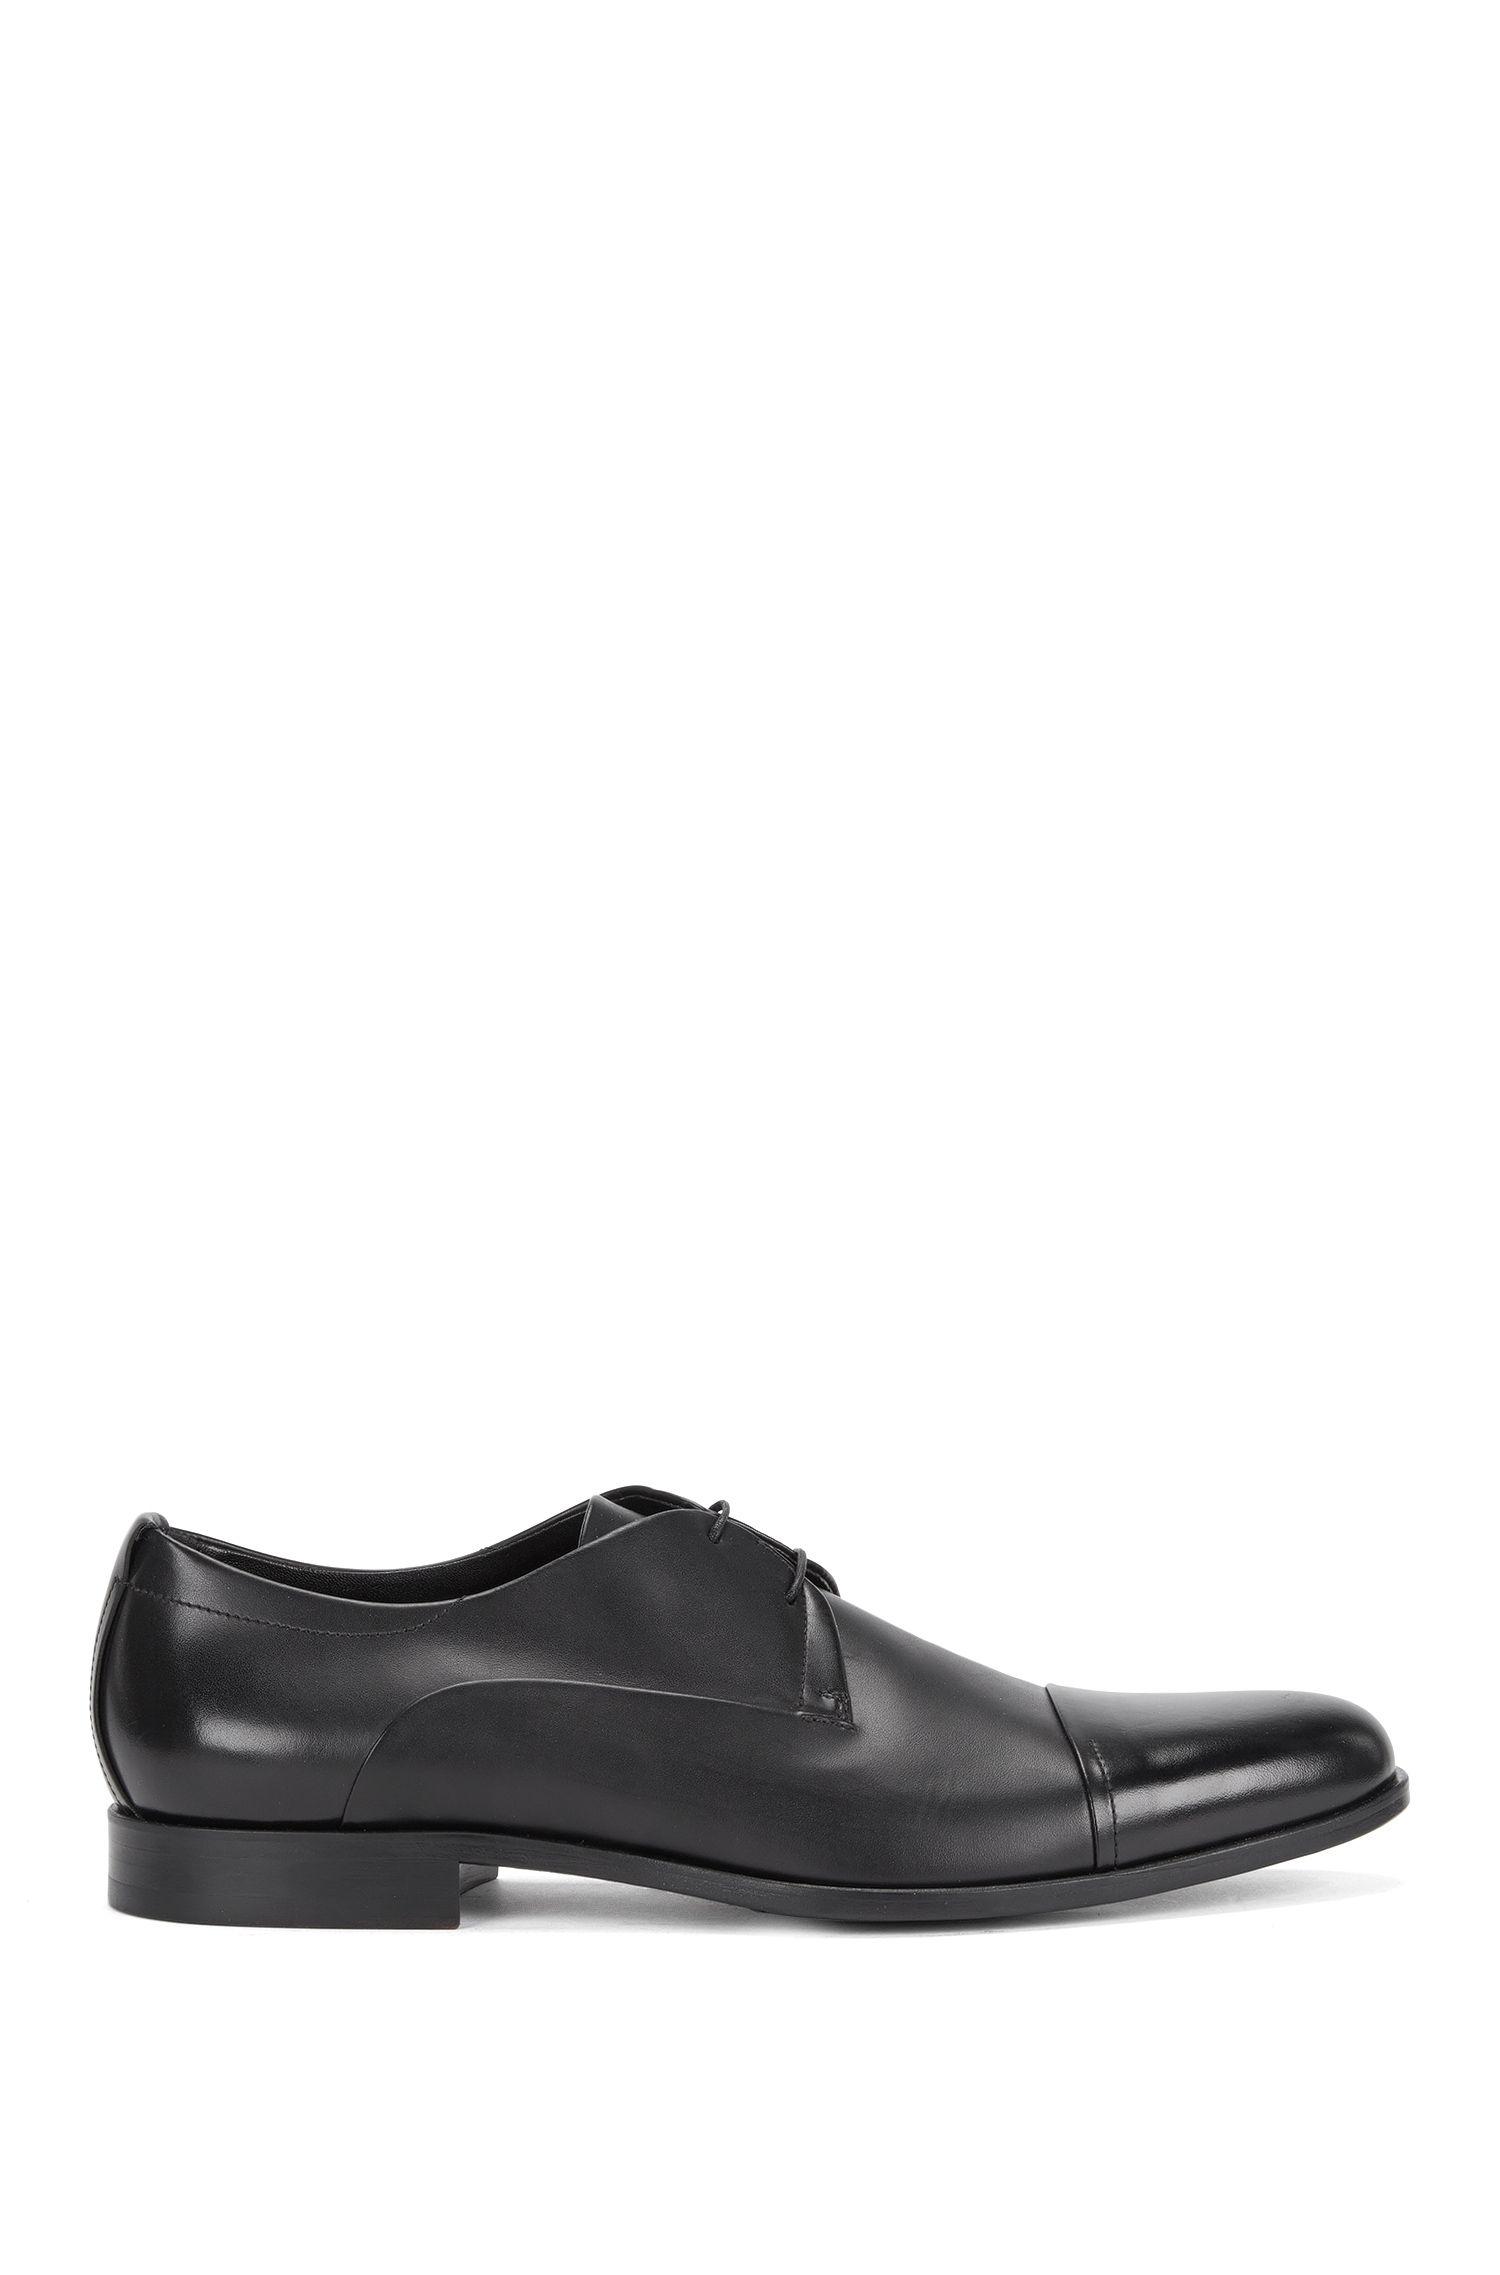 'Sigma Derb Itct' | Italian Calfskin Cap Toe Derby Dress Shoes